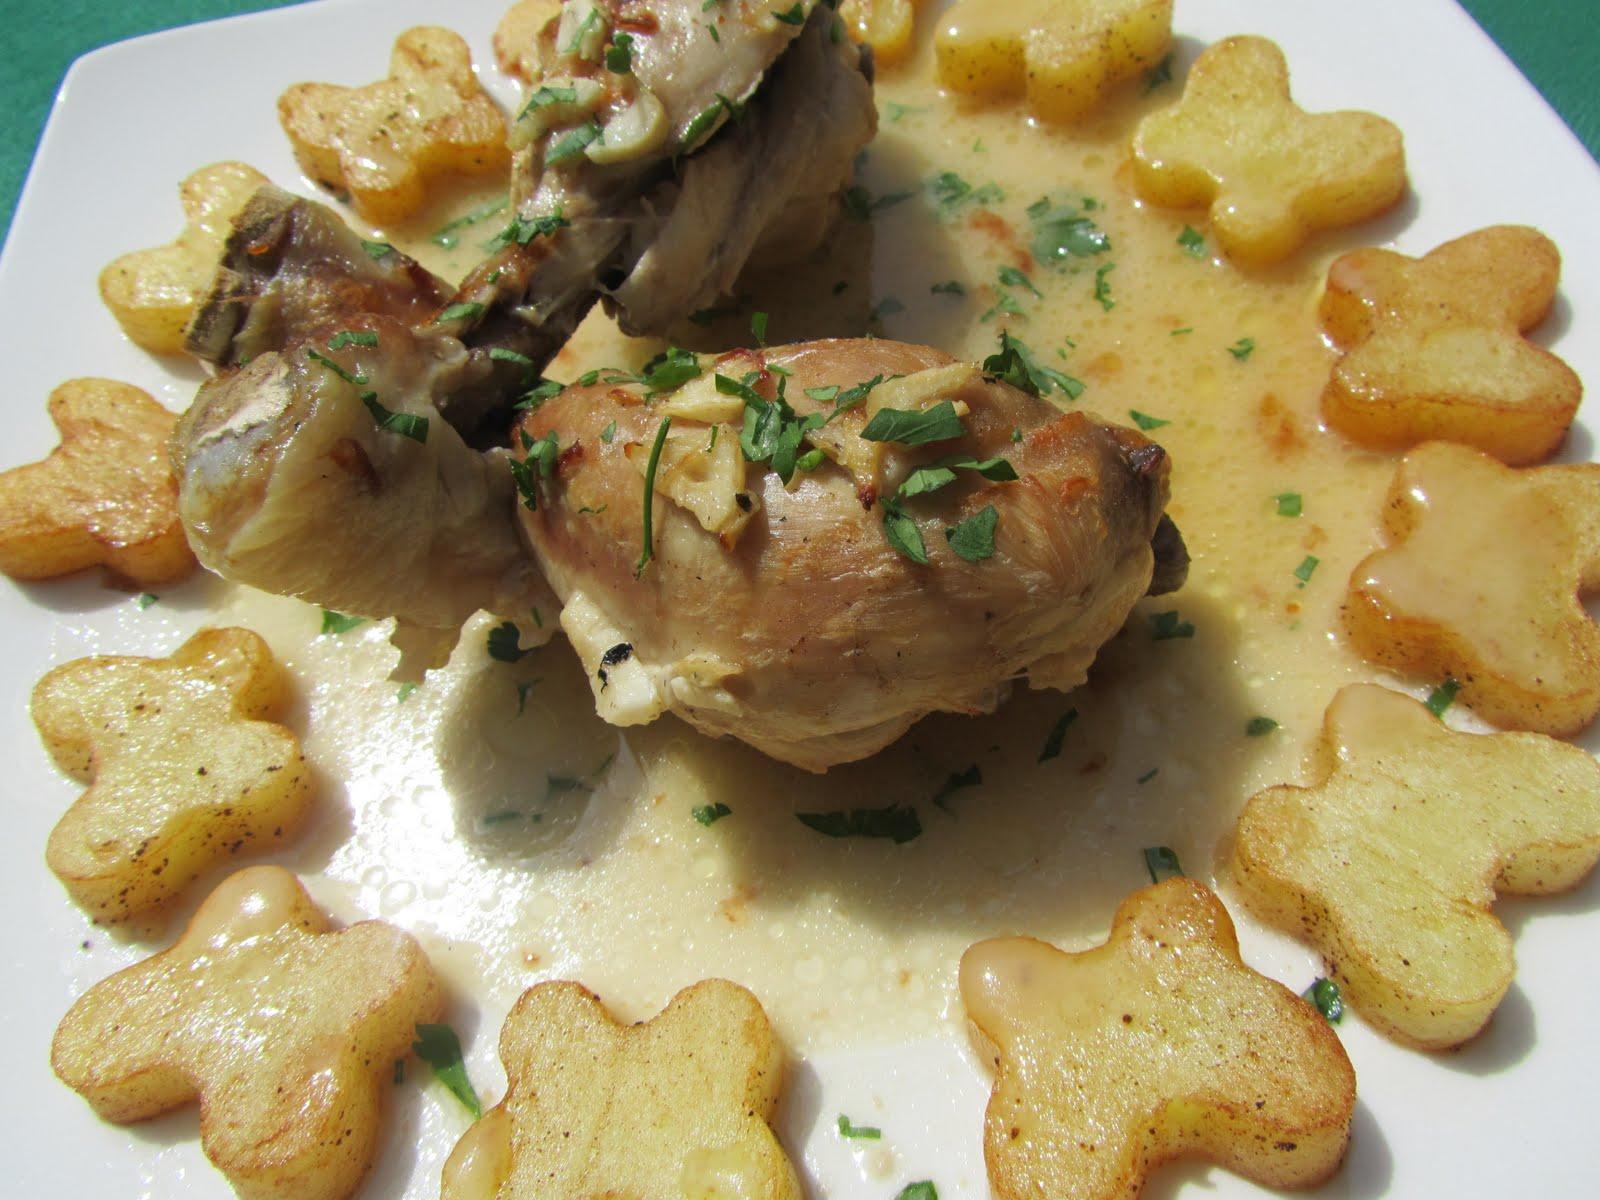 Muslitos de pollo al ajillo Thermomix